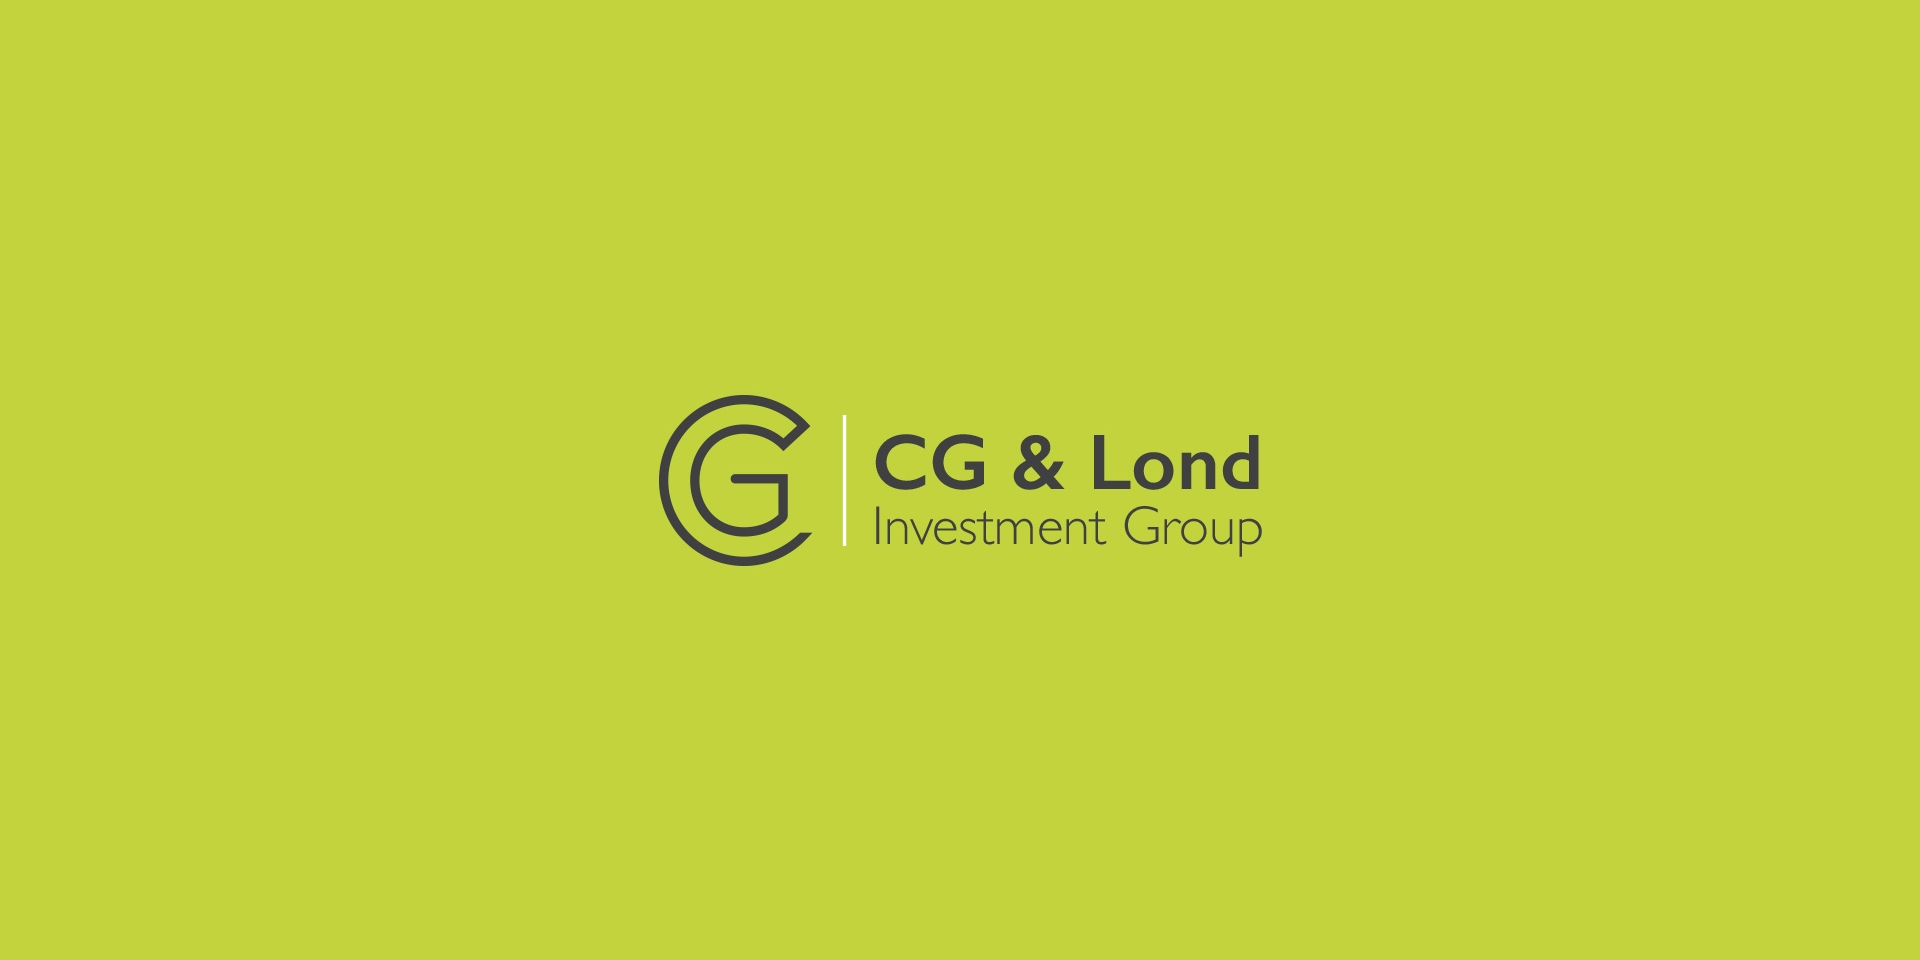 CG & LOND